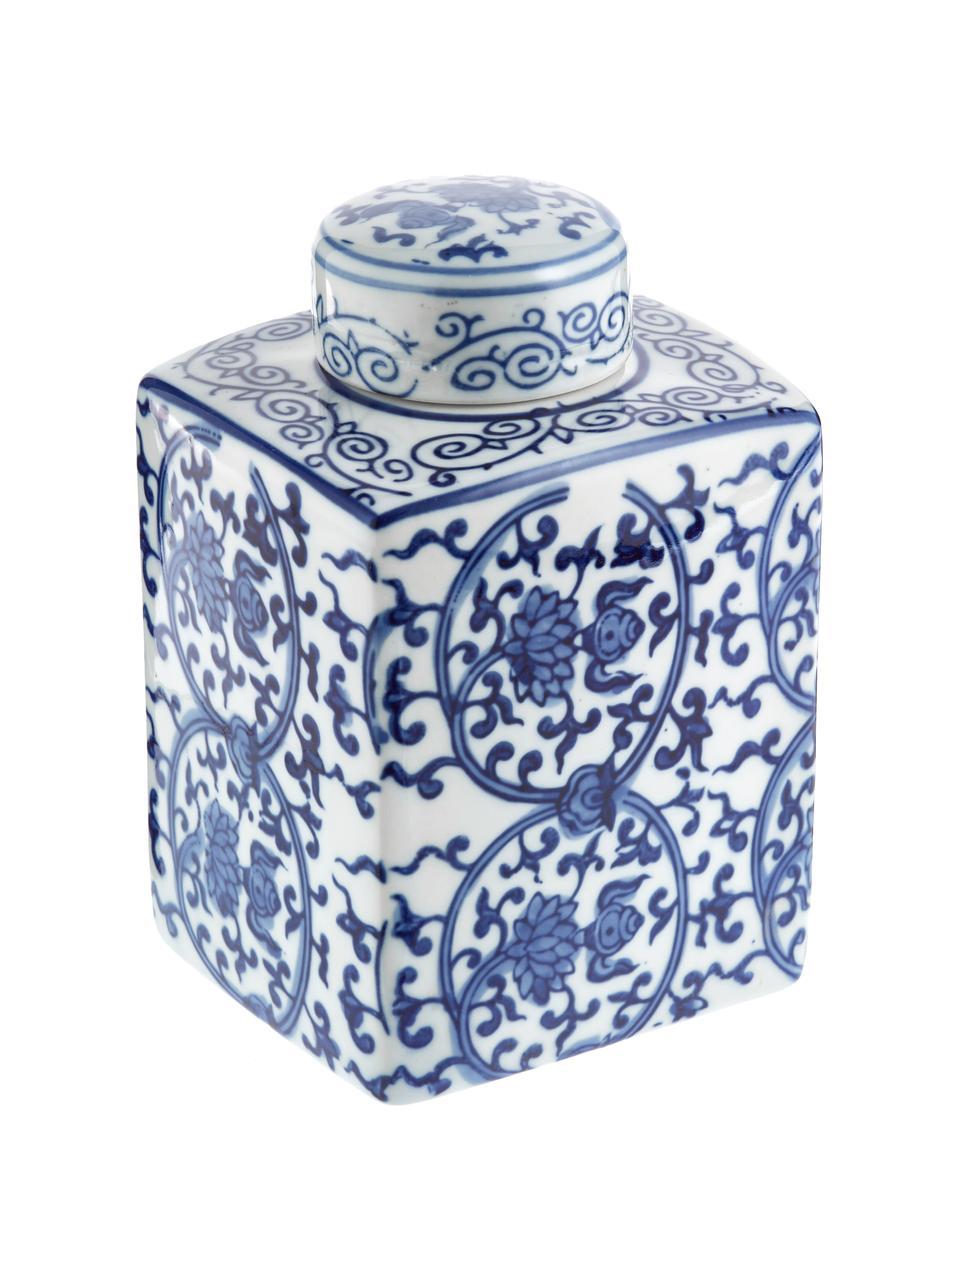 Vaas met deksel Ella uit porselein, Porselein, Blauw, wit, 11 x 17 cm